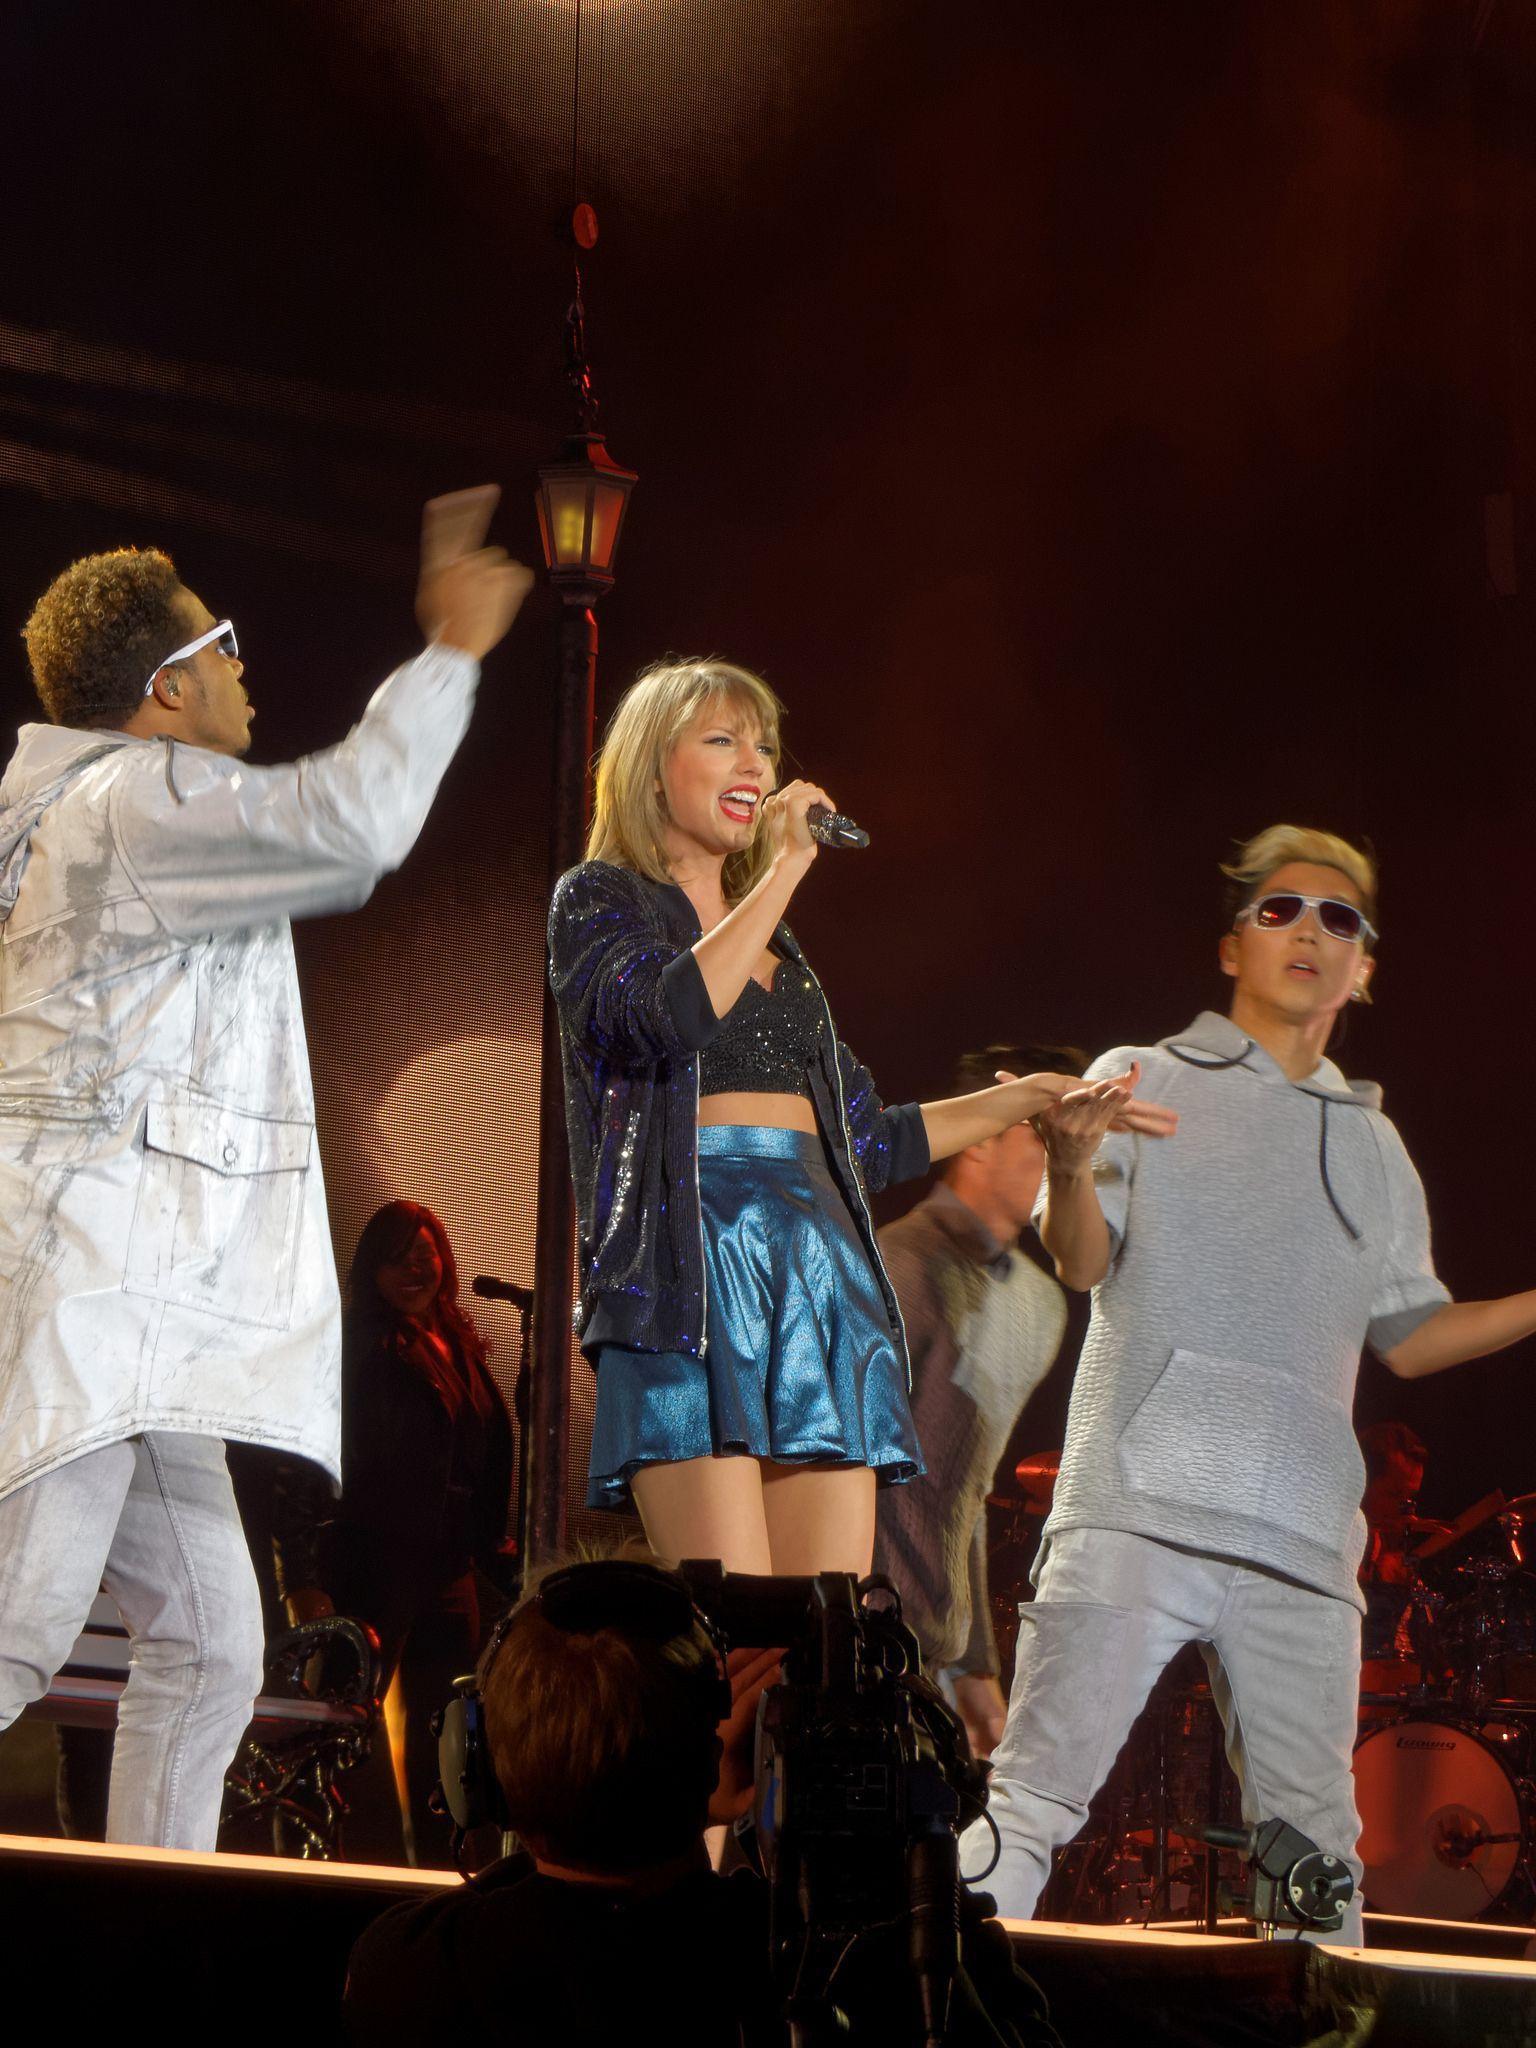 Taylor Swift 1989 Seattle Taylor Swift 1989 Taylor Swift Pictures Taylor Swift